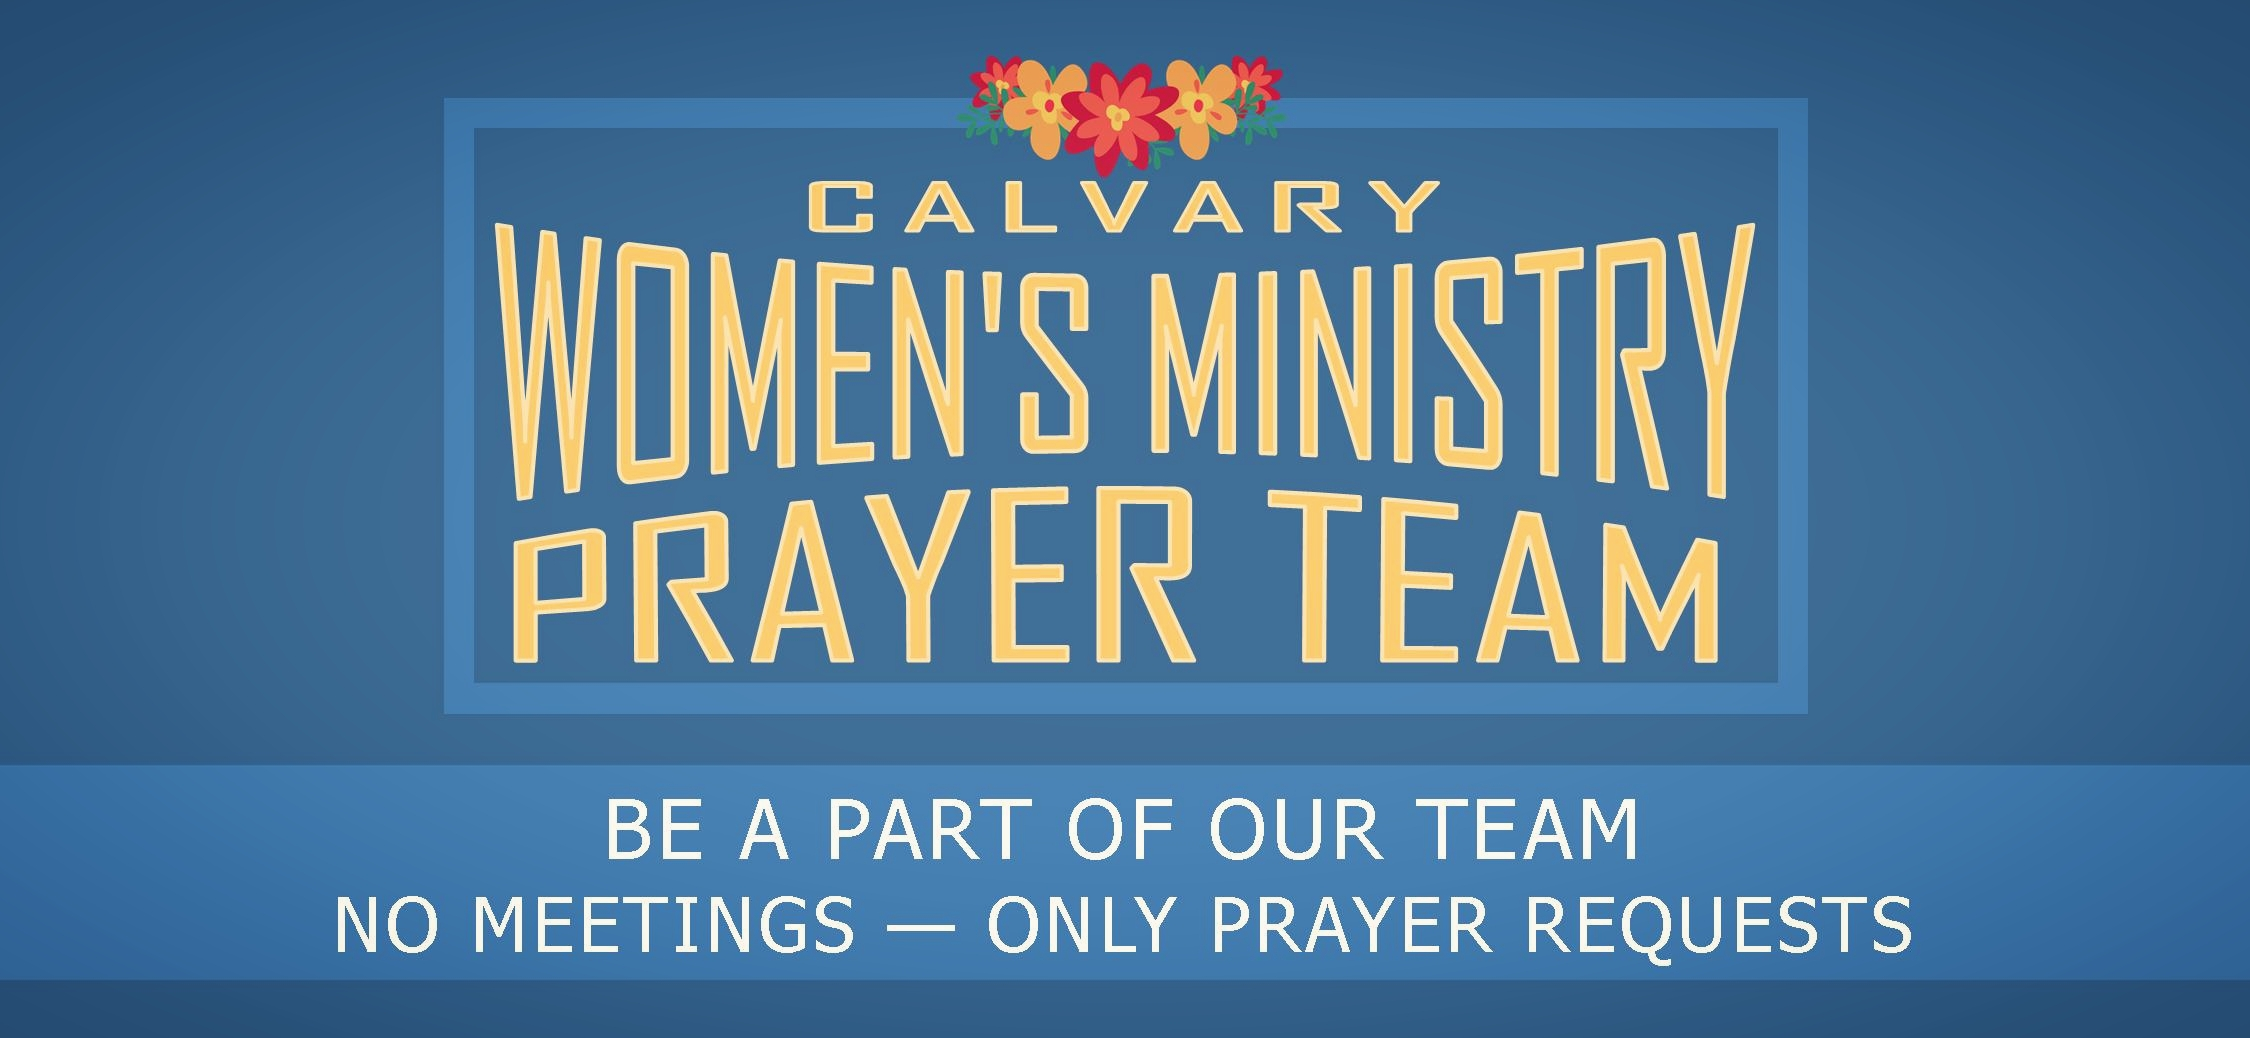 Calvary Womens Min Prayer Team 022818.jpg